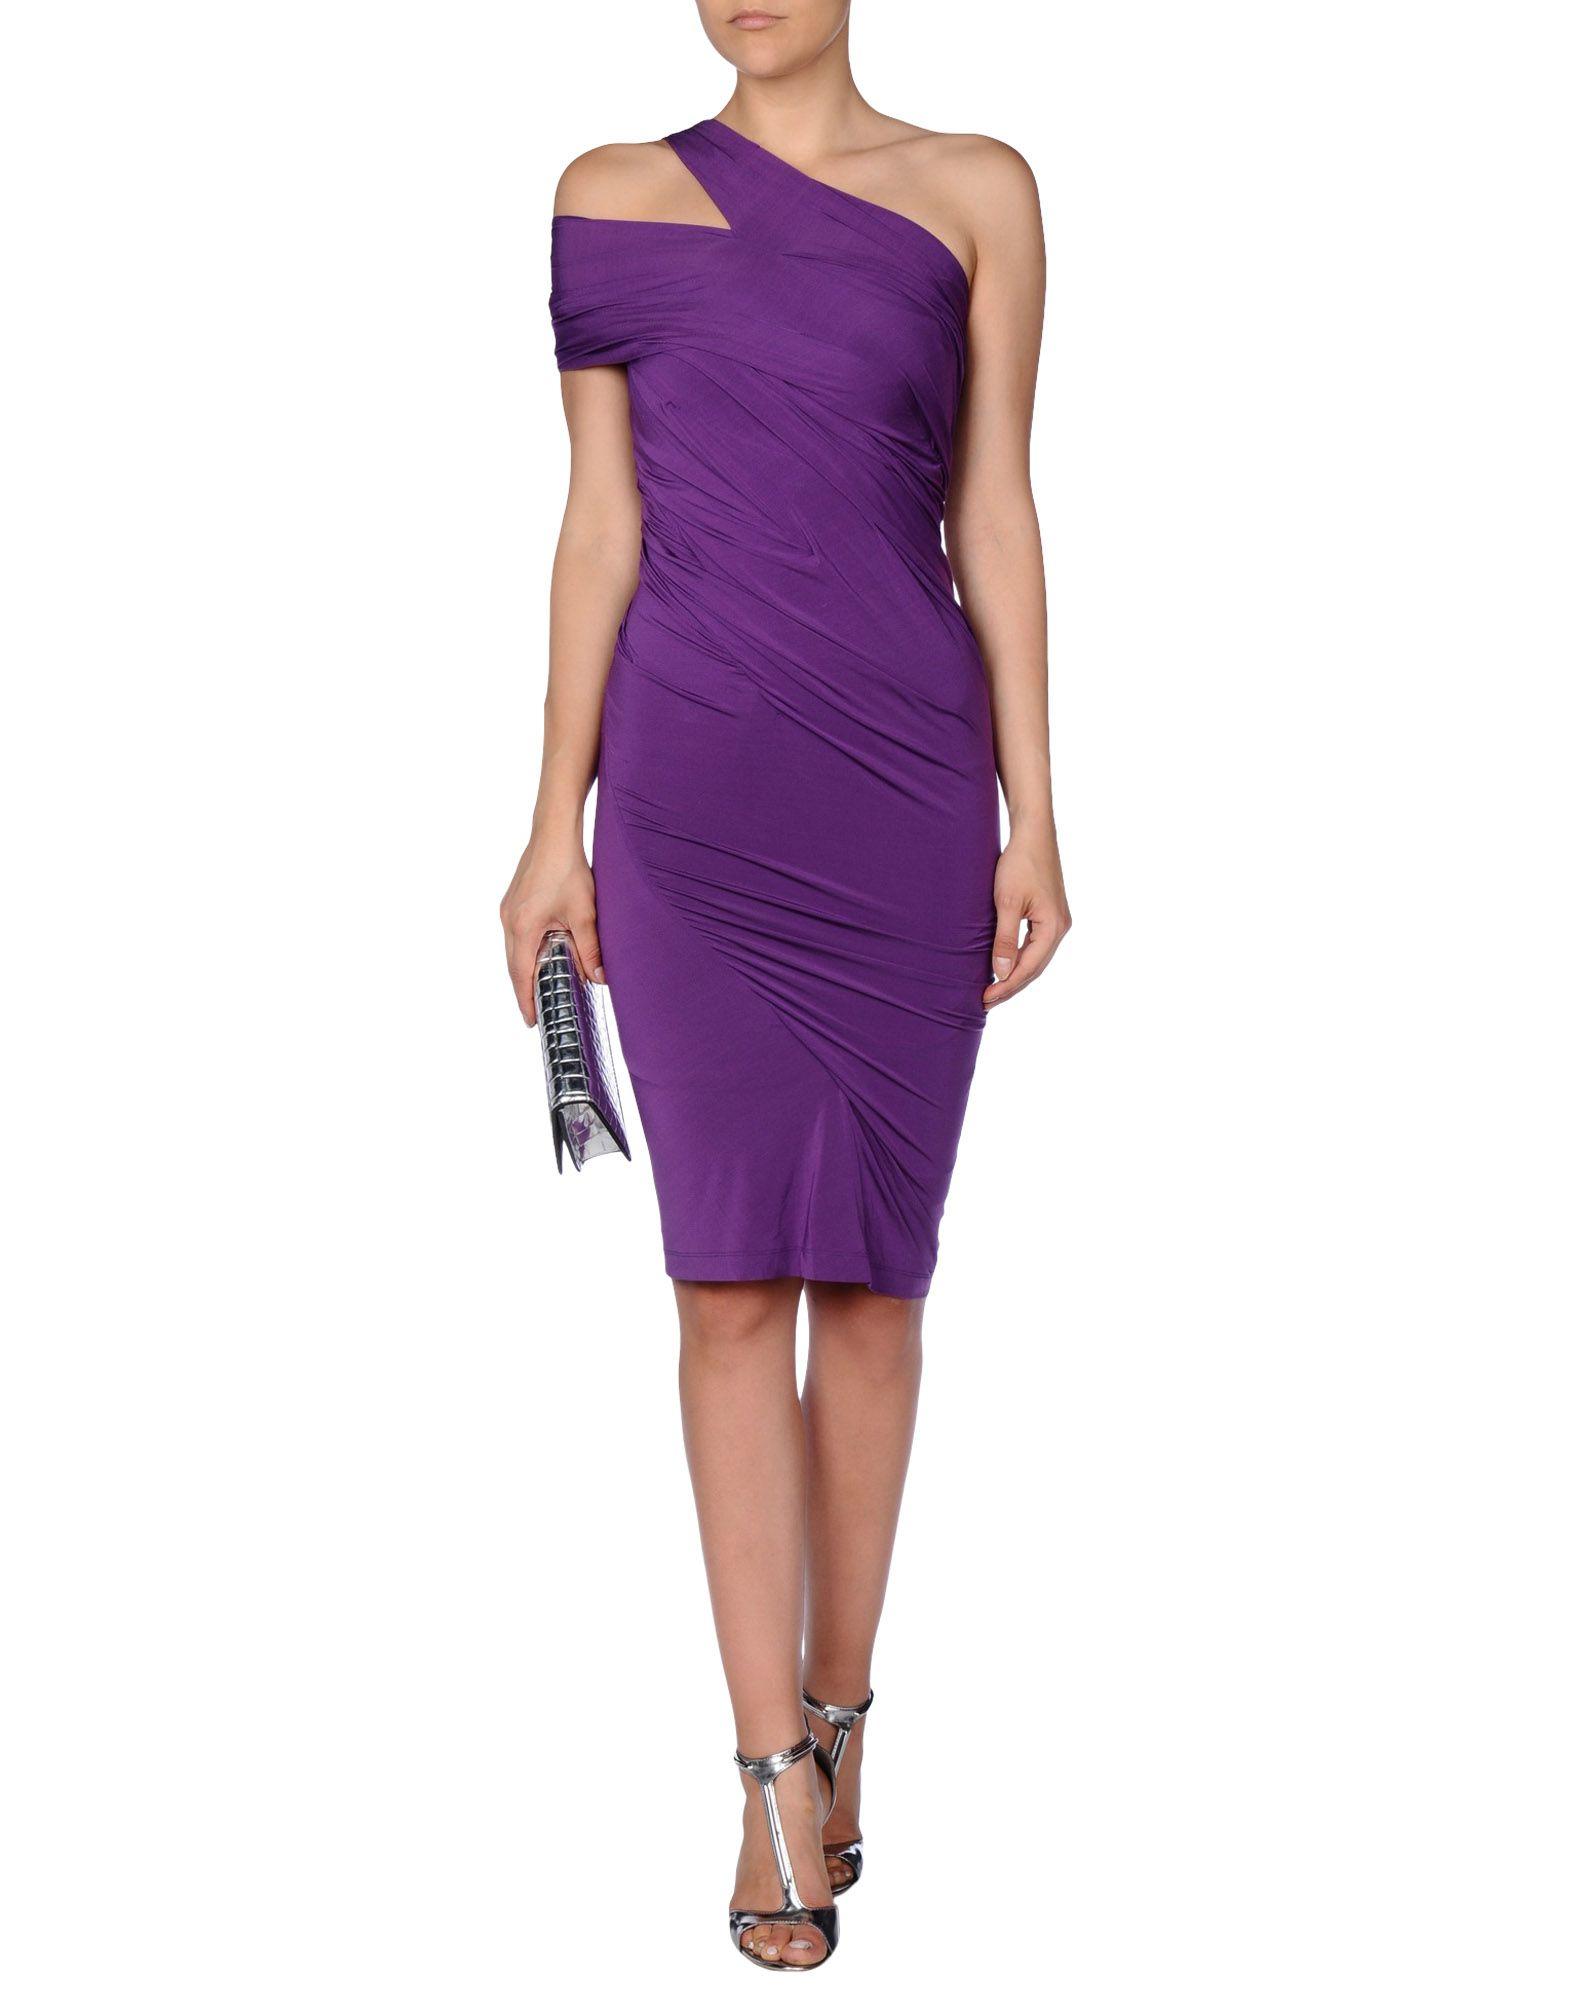 Lyst - Donna Karan Short Dress in Purple